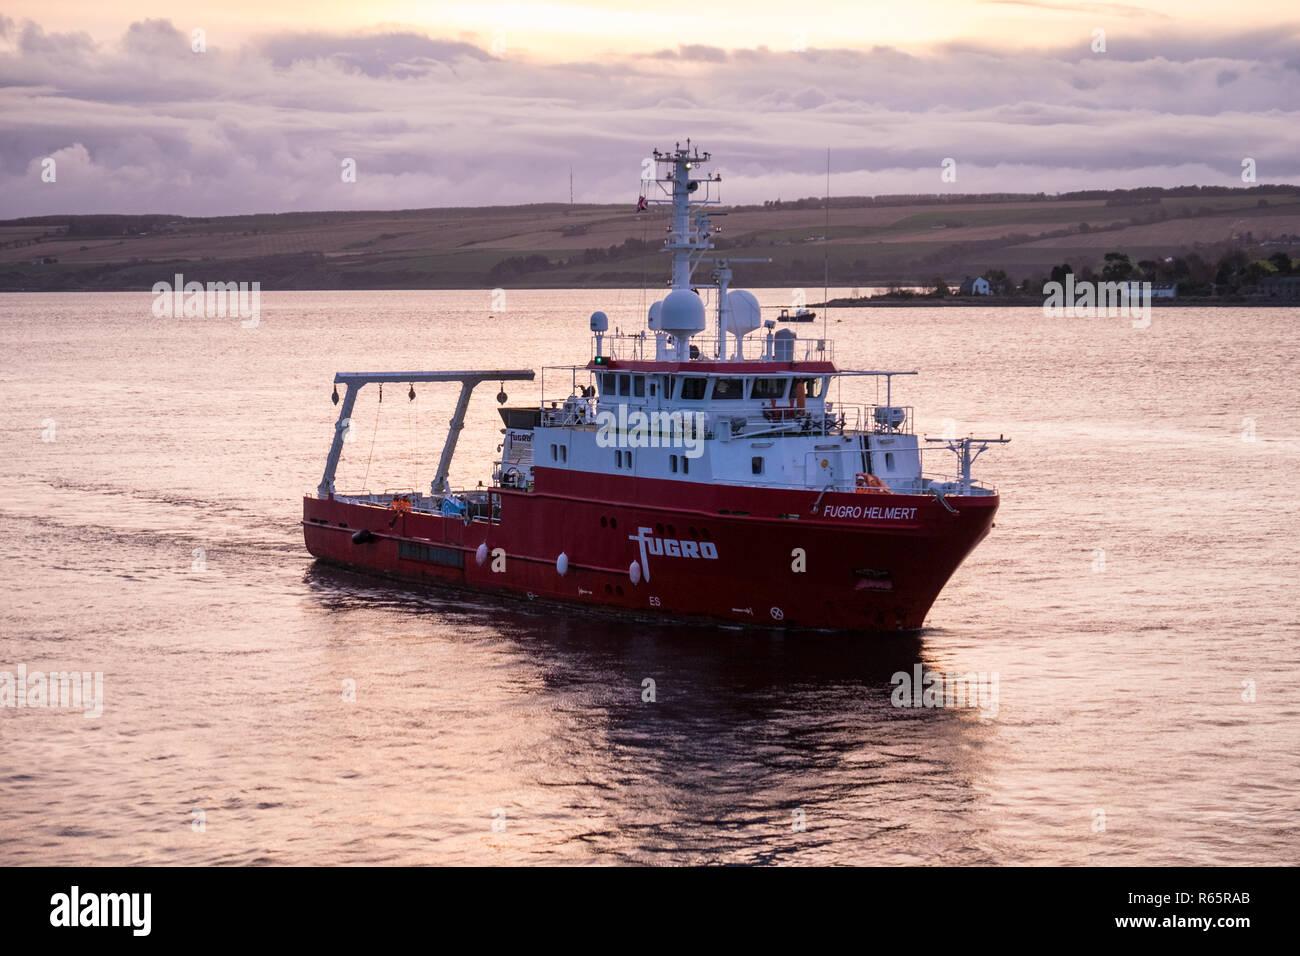 The survey vessel Fugro Helmert in Invergordon, Scotland - Stock Image